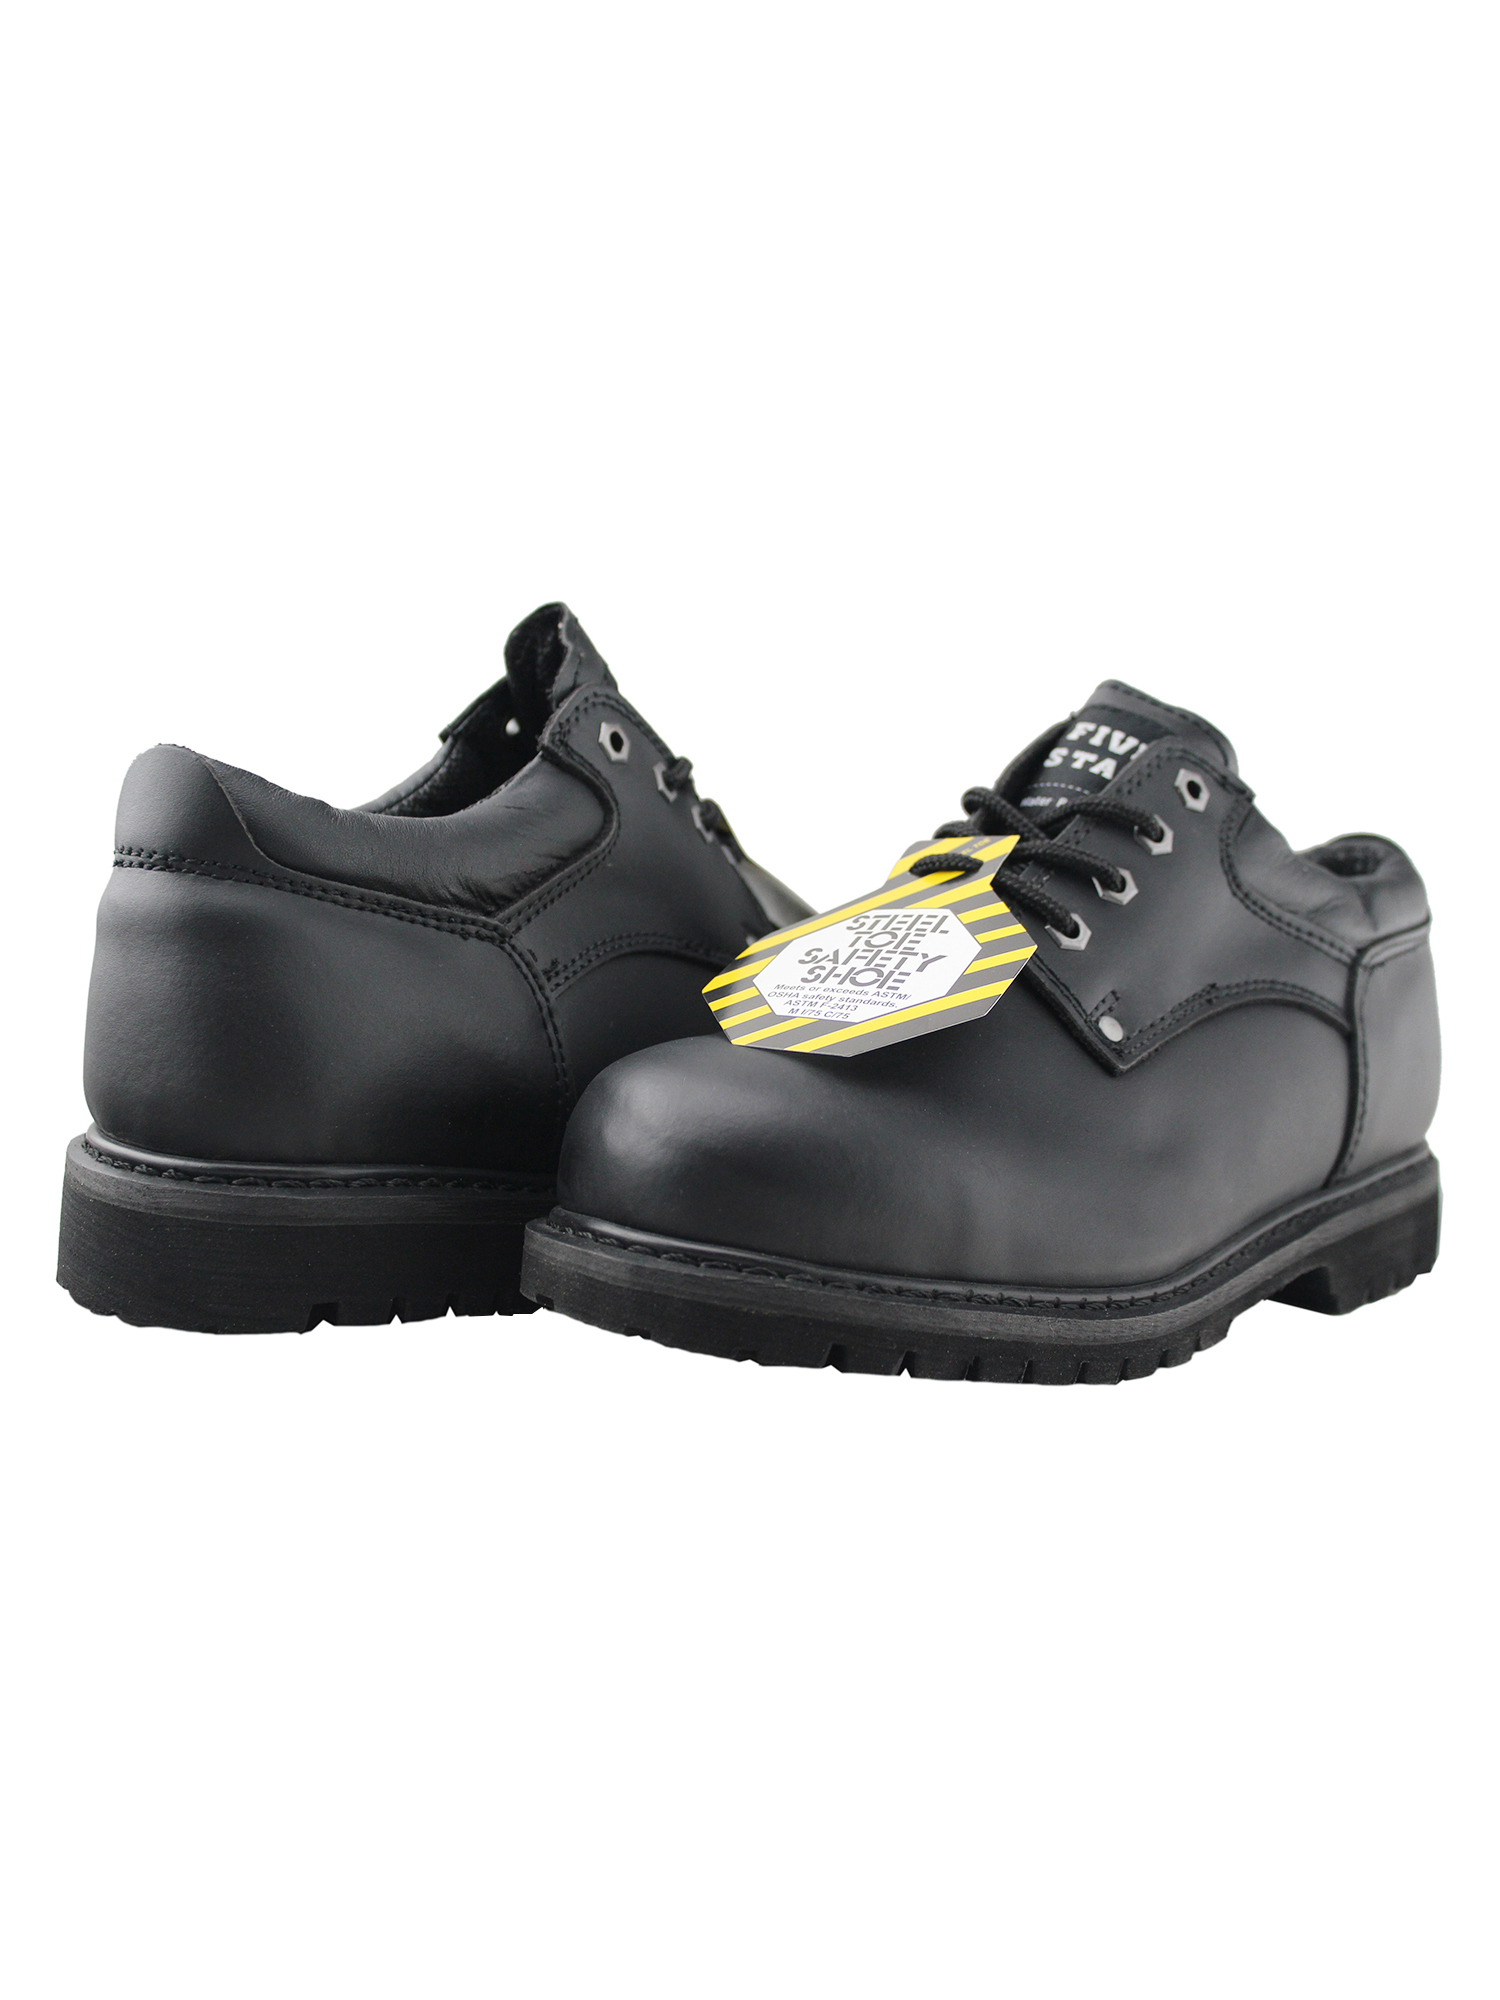 Slip Resistant Safety Shoes - Walmart